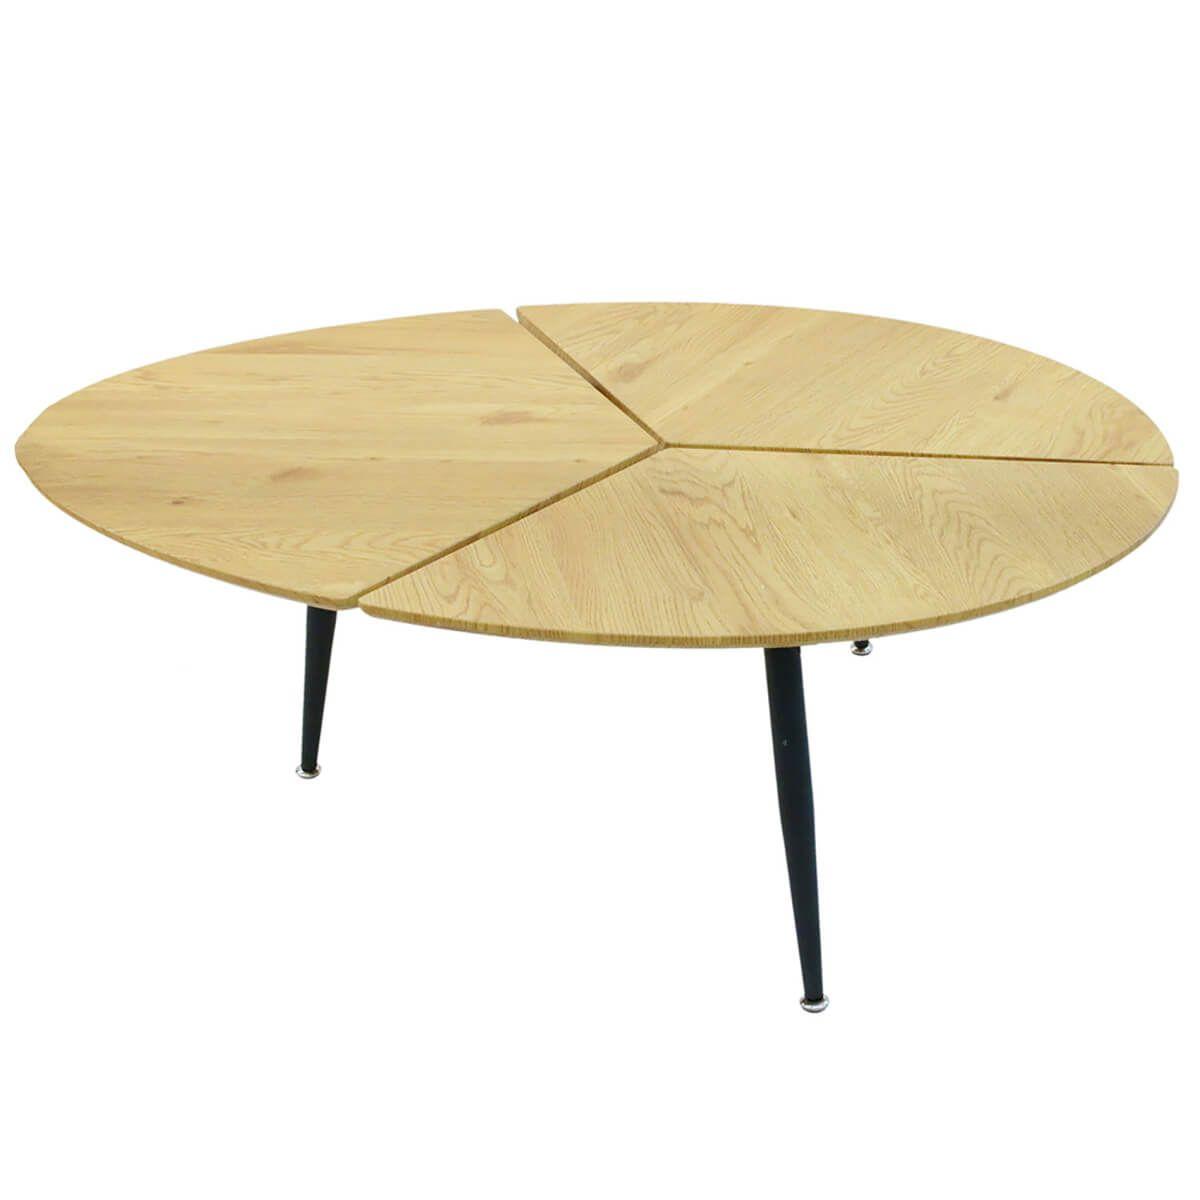 Altobuy Milda Table Basse Ovale Pieds Metal Et Plateau Bois Neuf Ebay